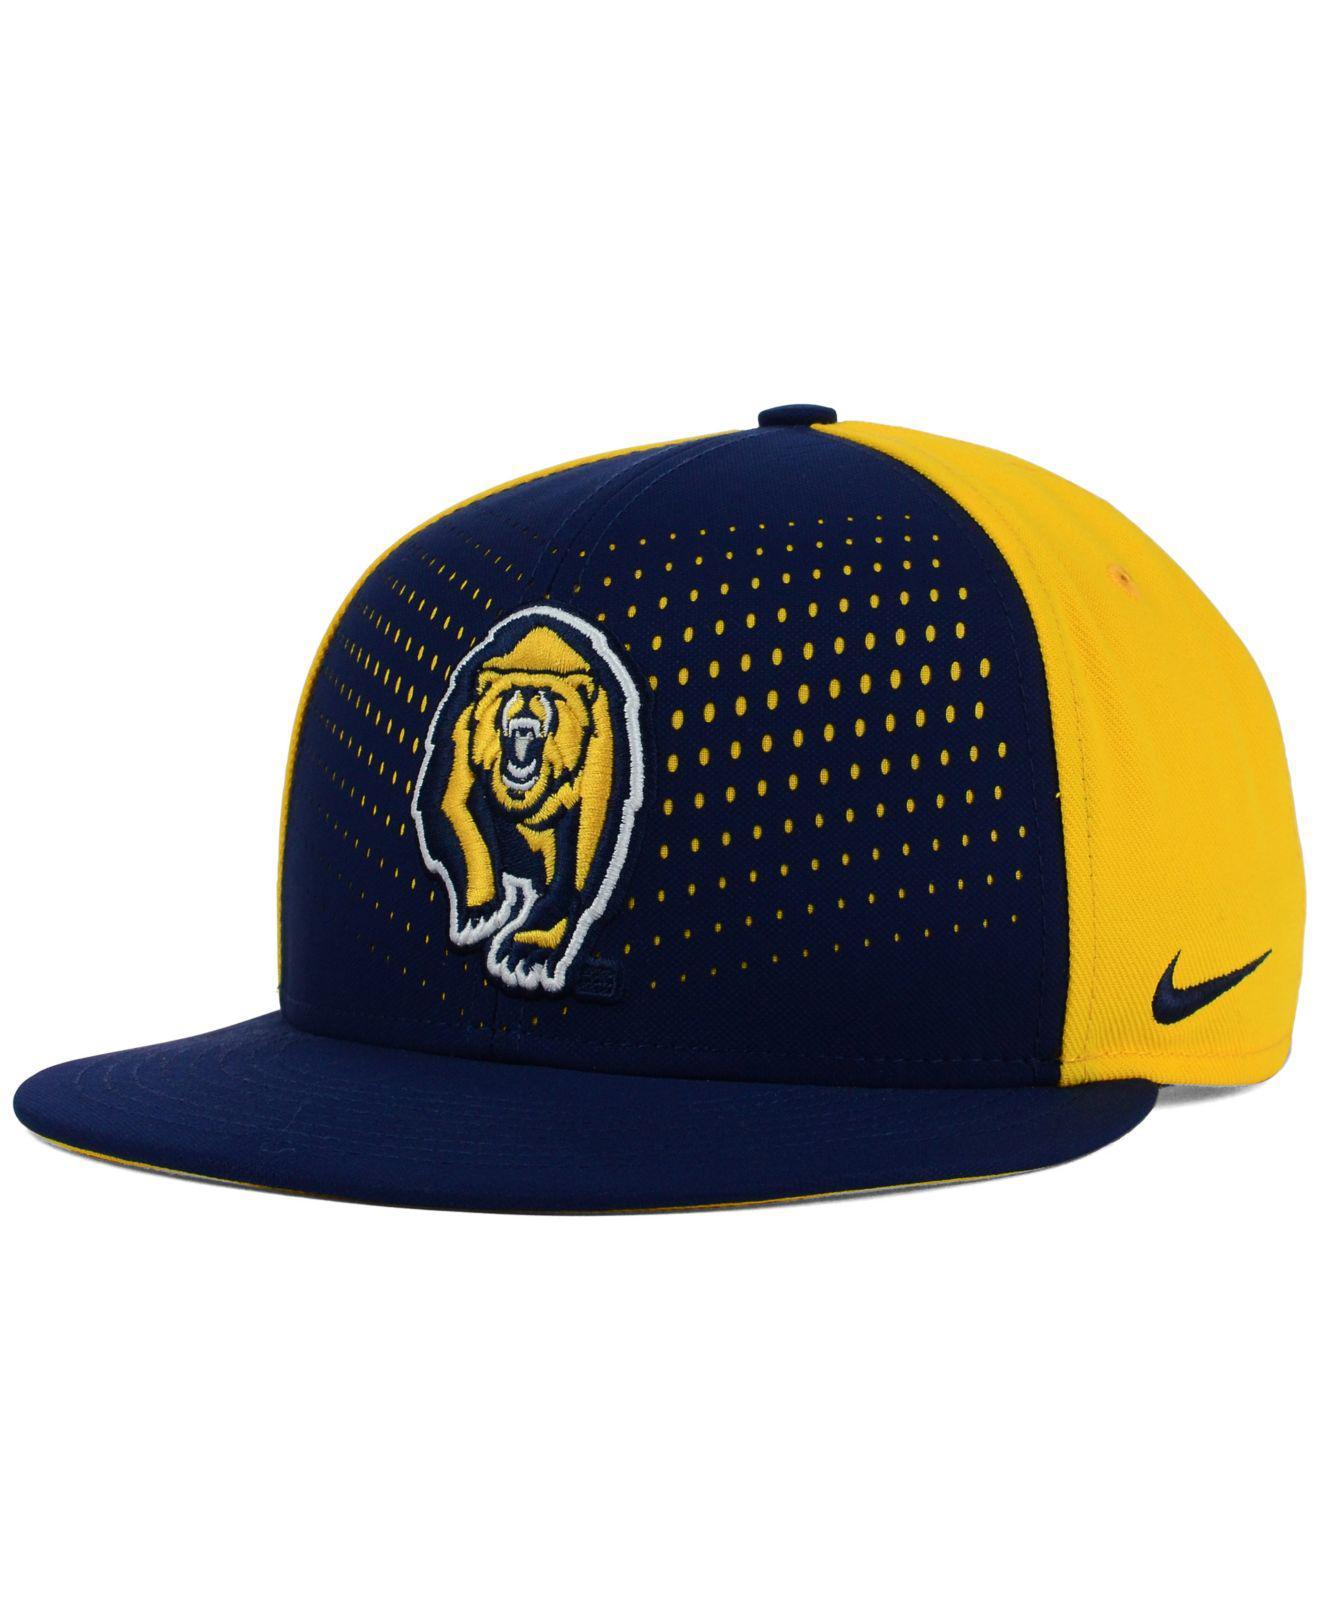 3e1e42ff990d7 ... release date lyst nike california golden bears true seasonal snapback  cap in 15b58 6b265